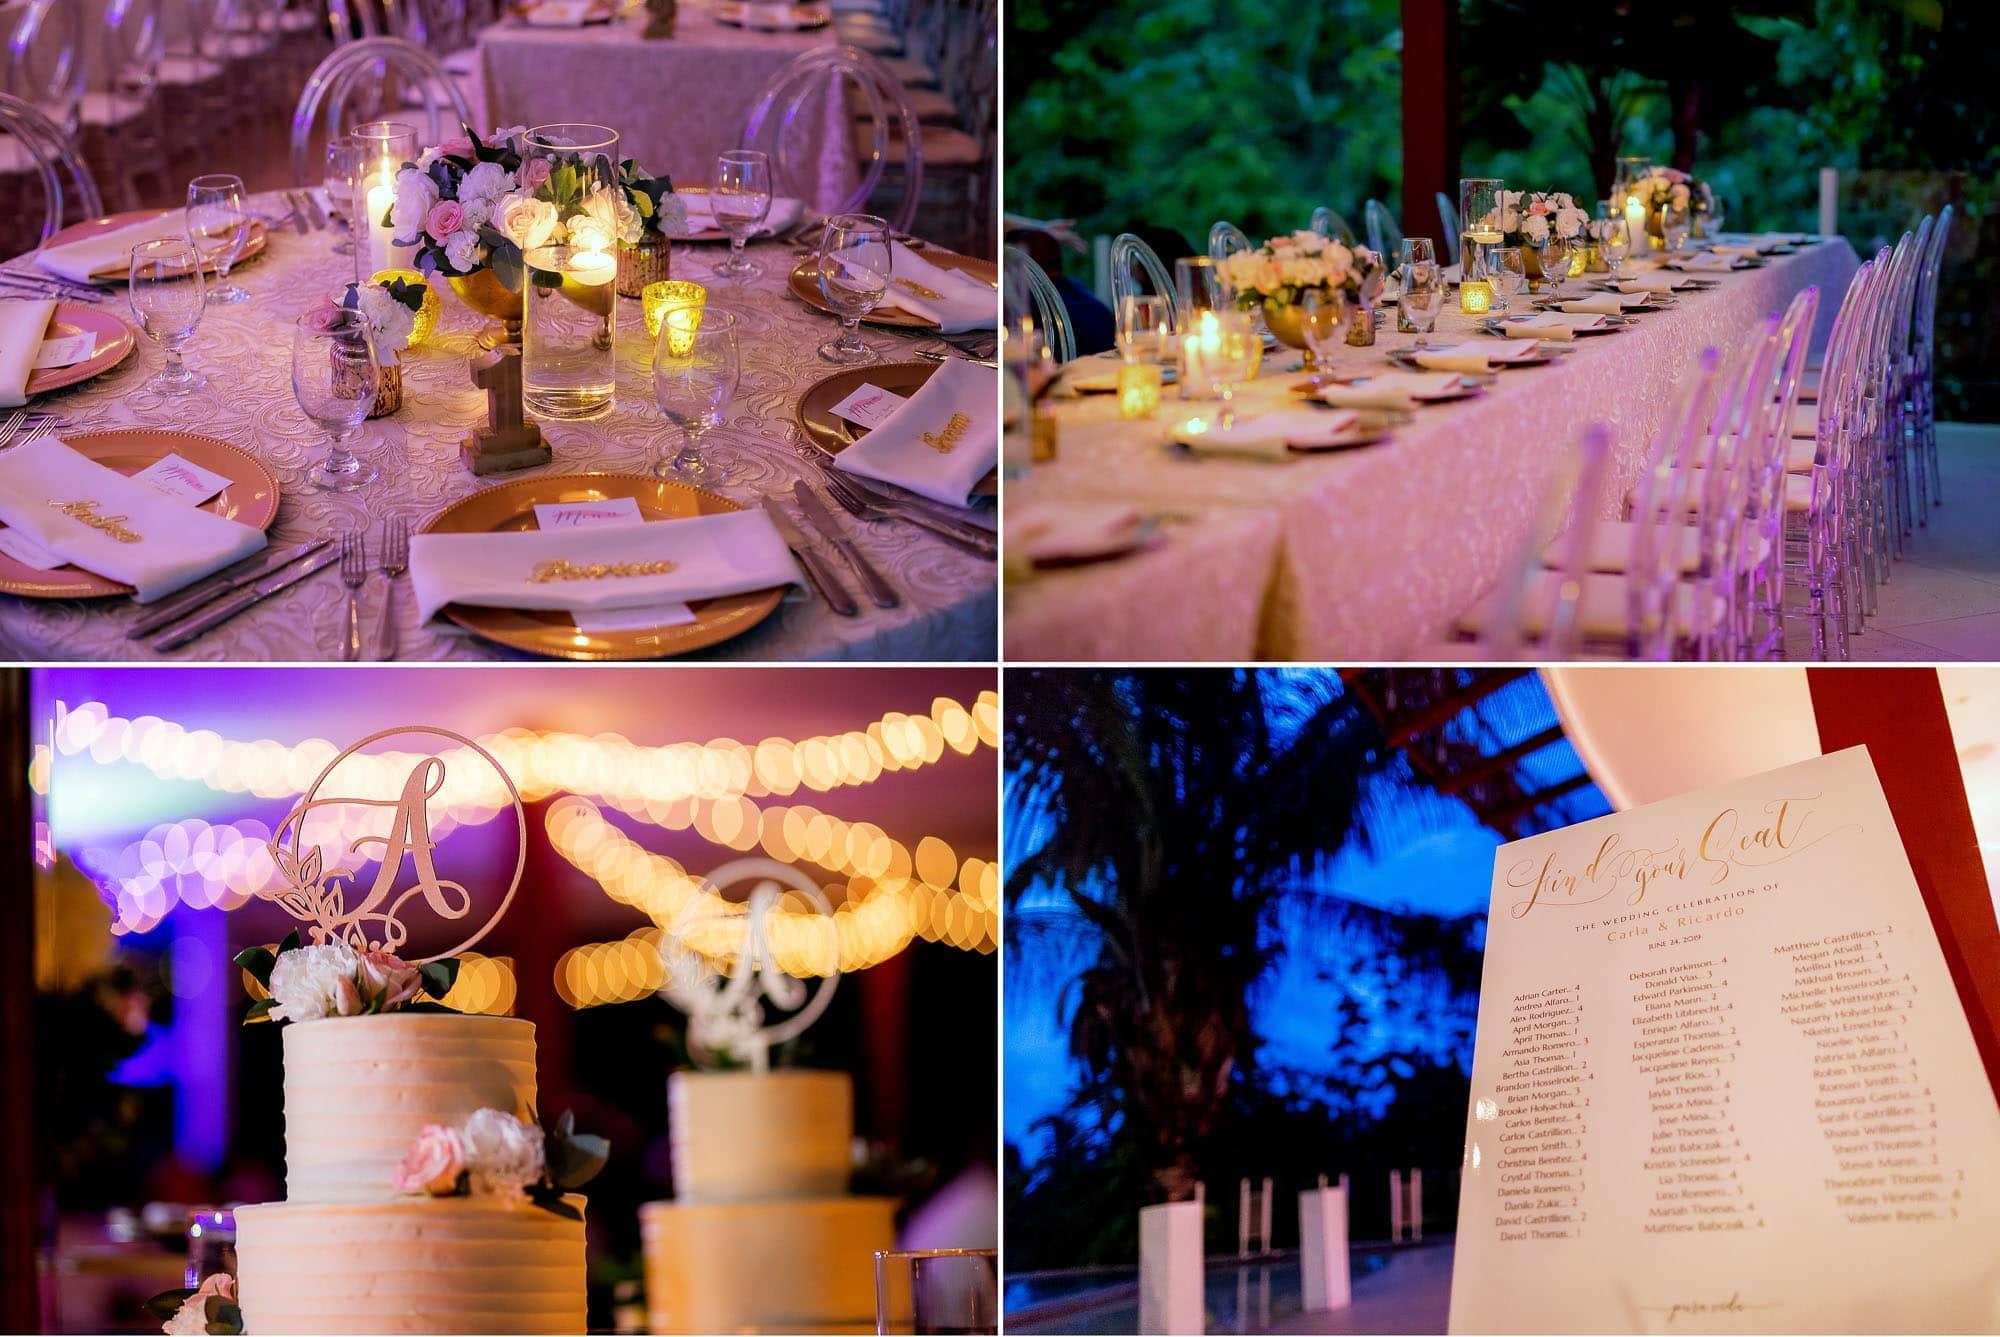 Wedding venue ideas: closeups on the details